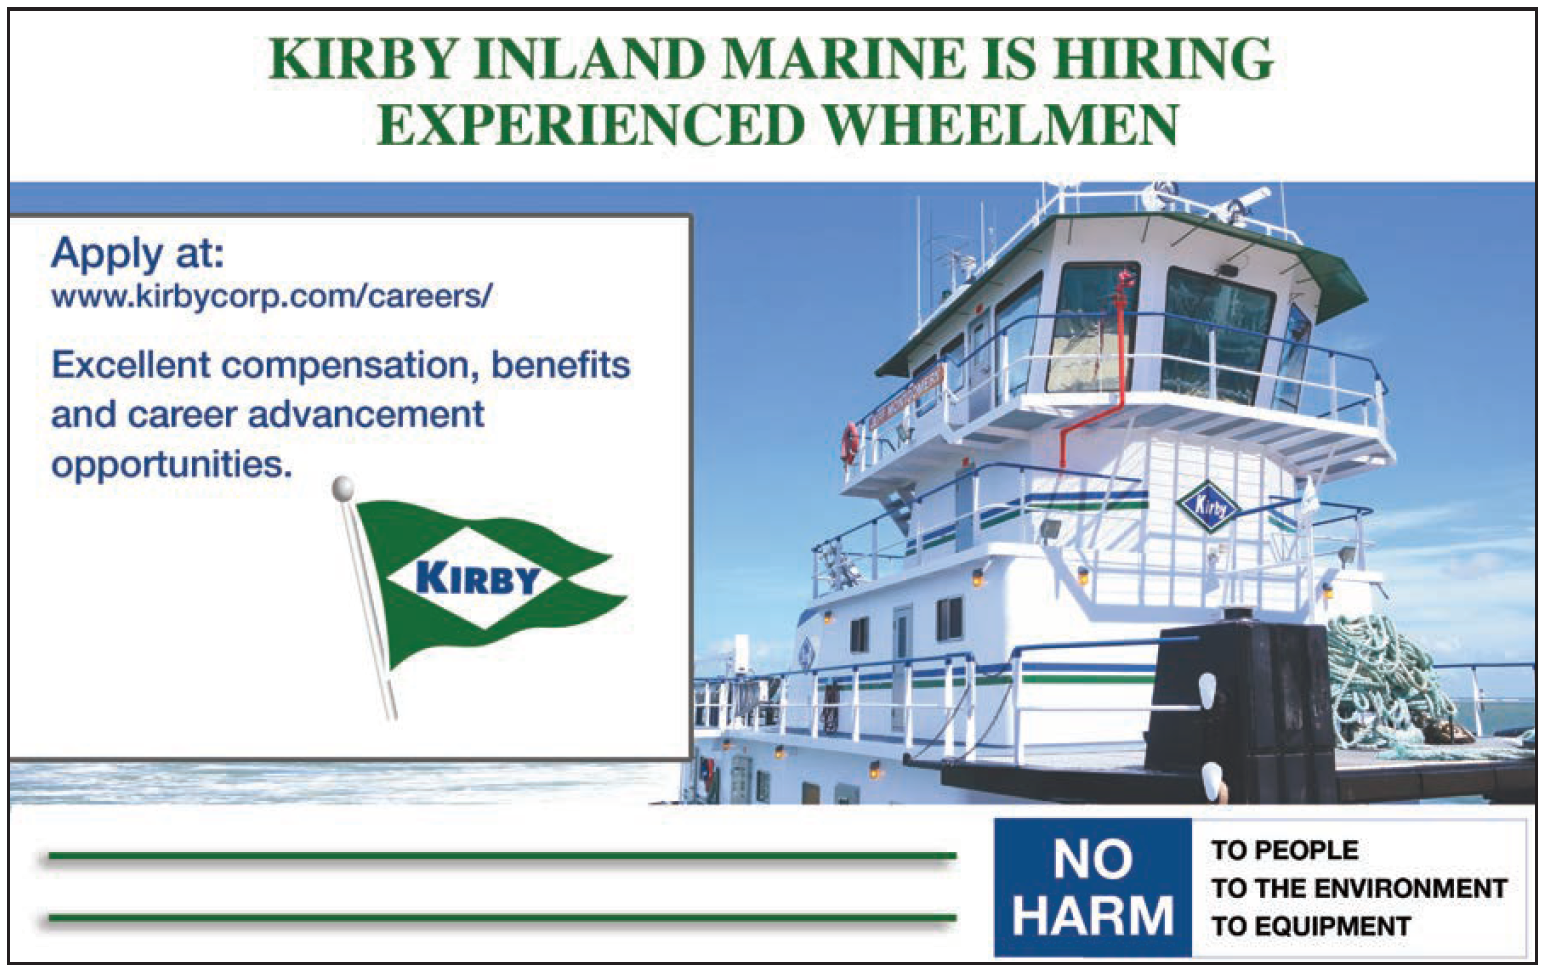 Kirby Inland Marine Service Hiring Wheelmen